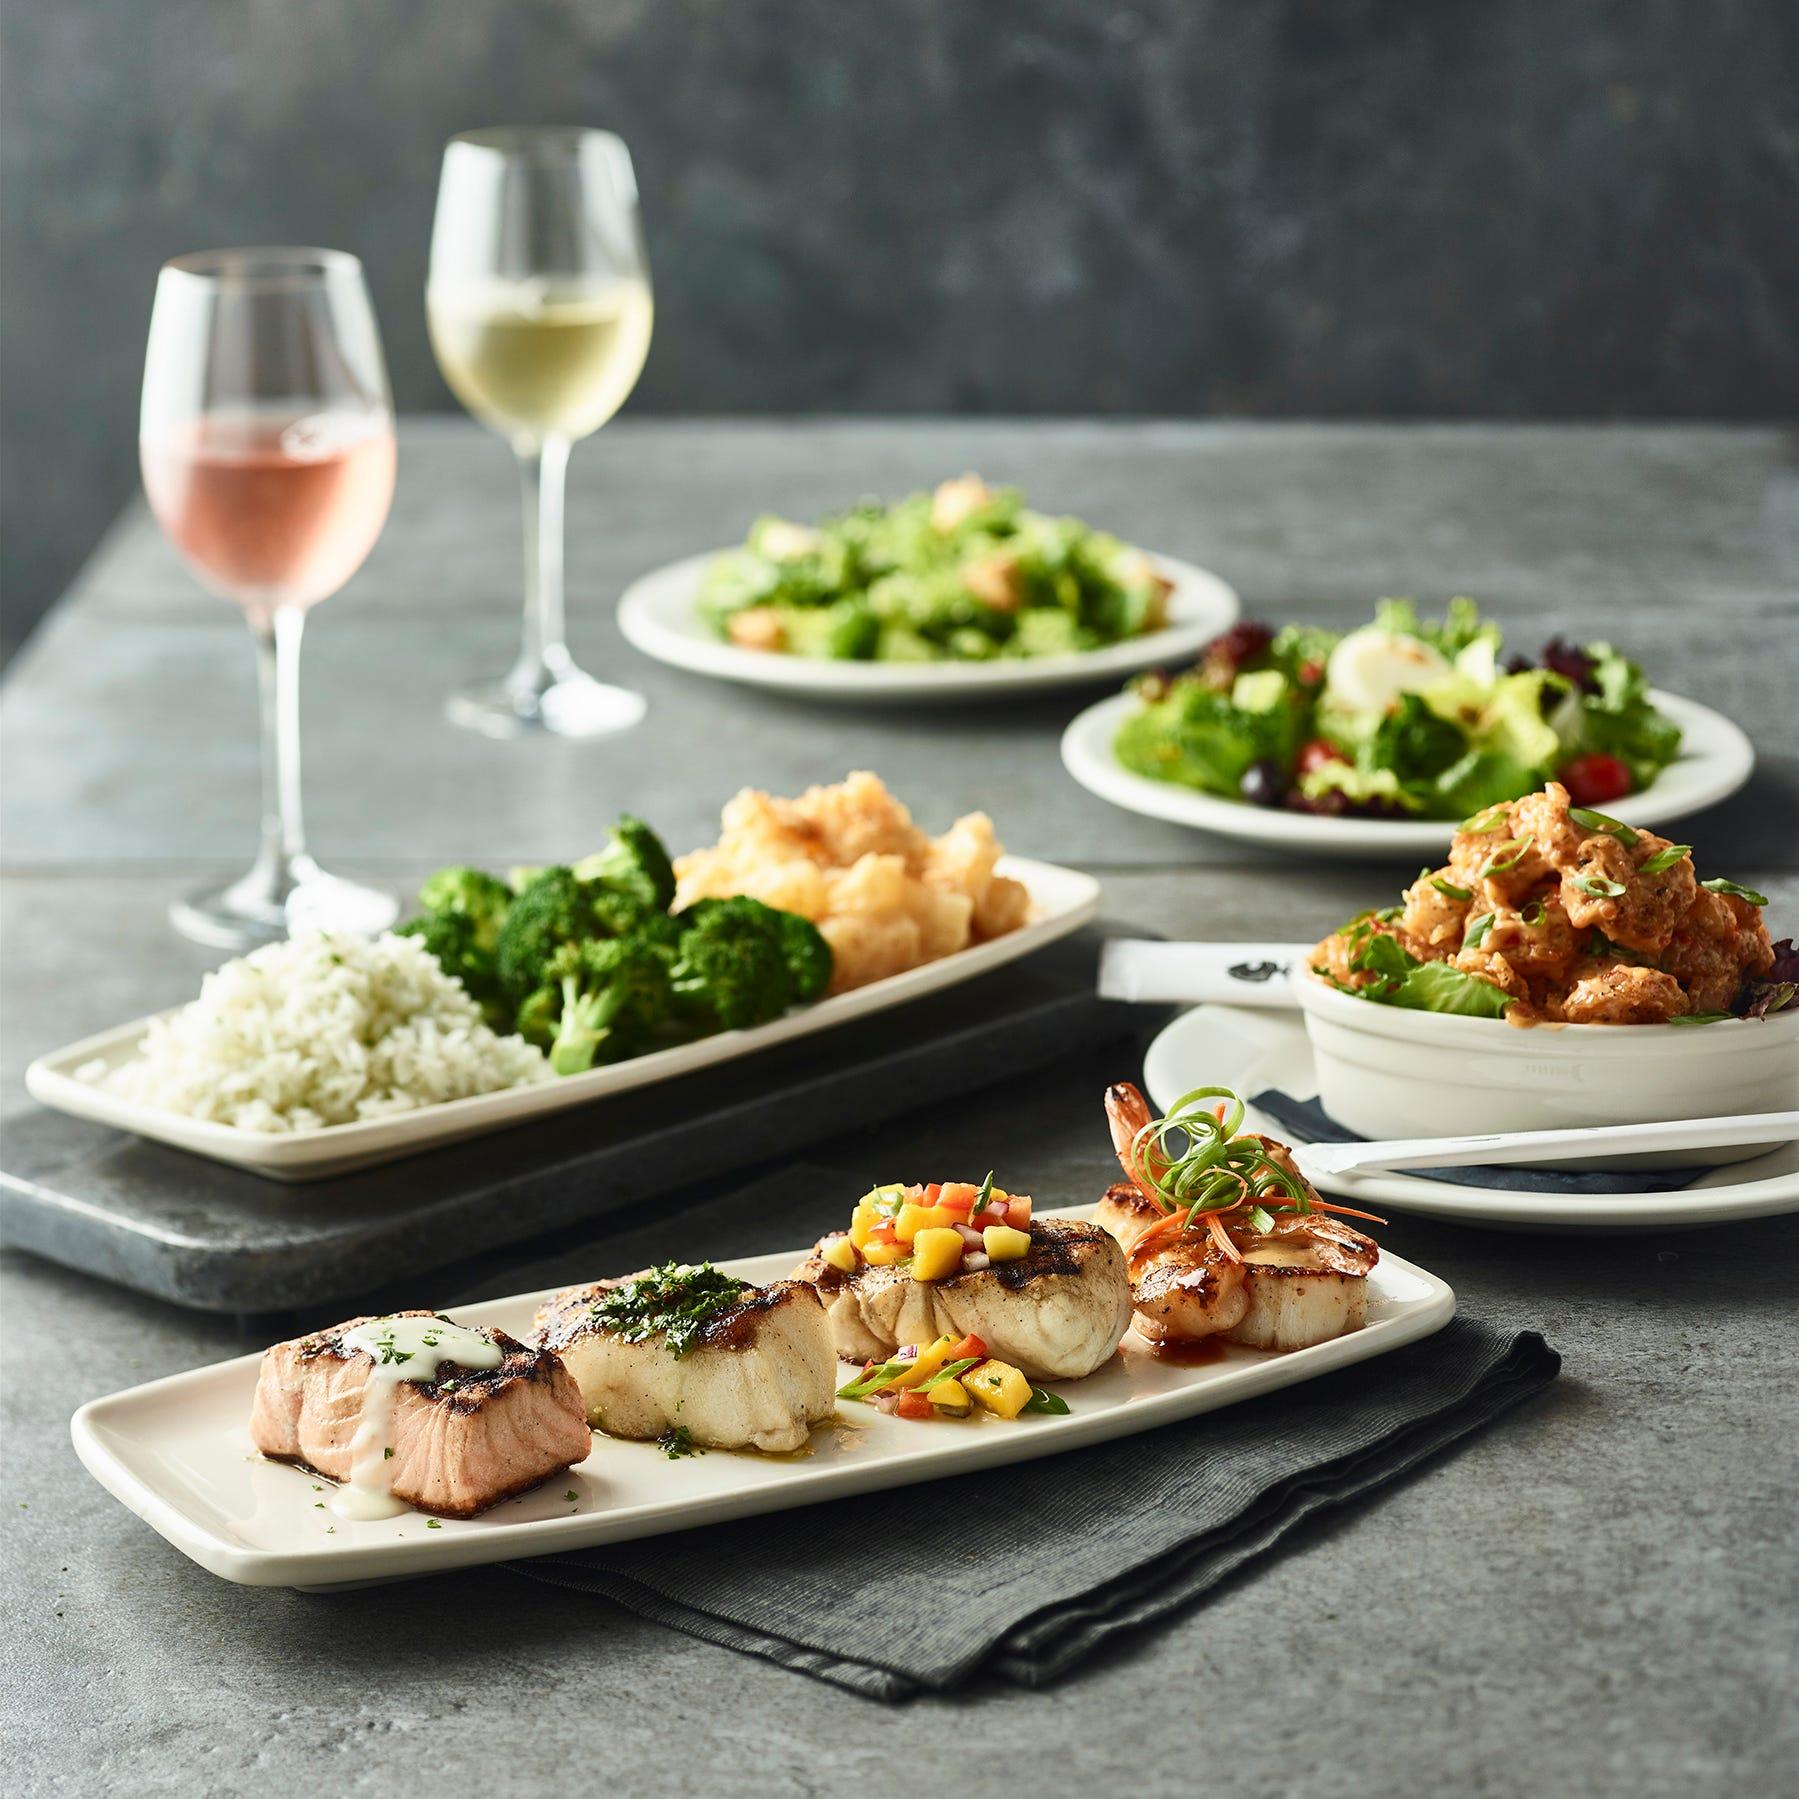 Bonefish Grill serving up'OMG' dinnerfor 2inSept.  Table Settings